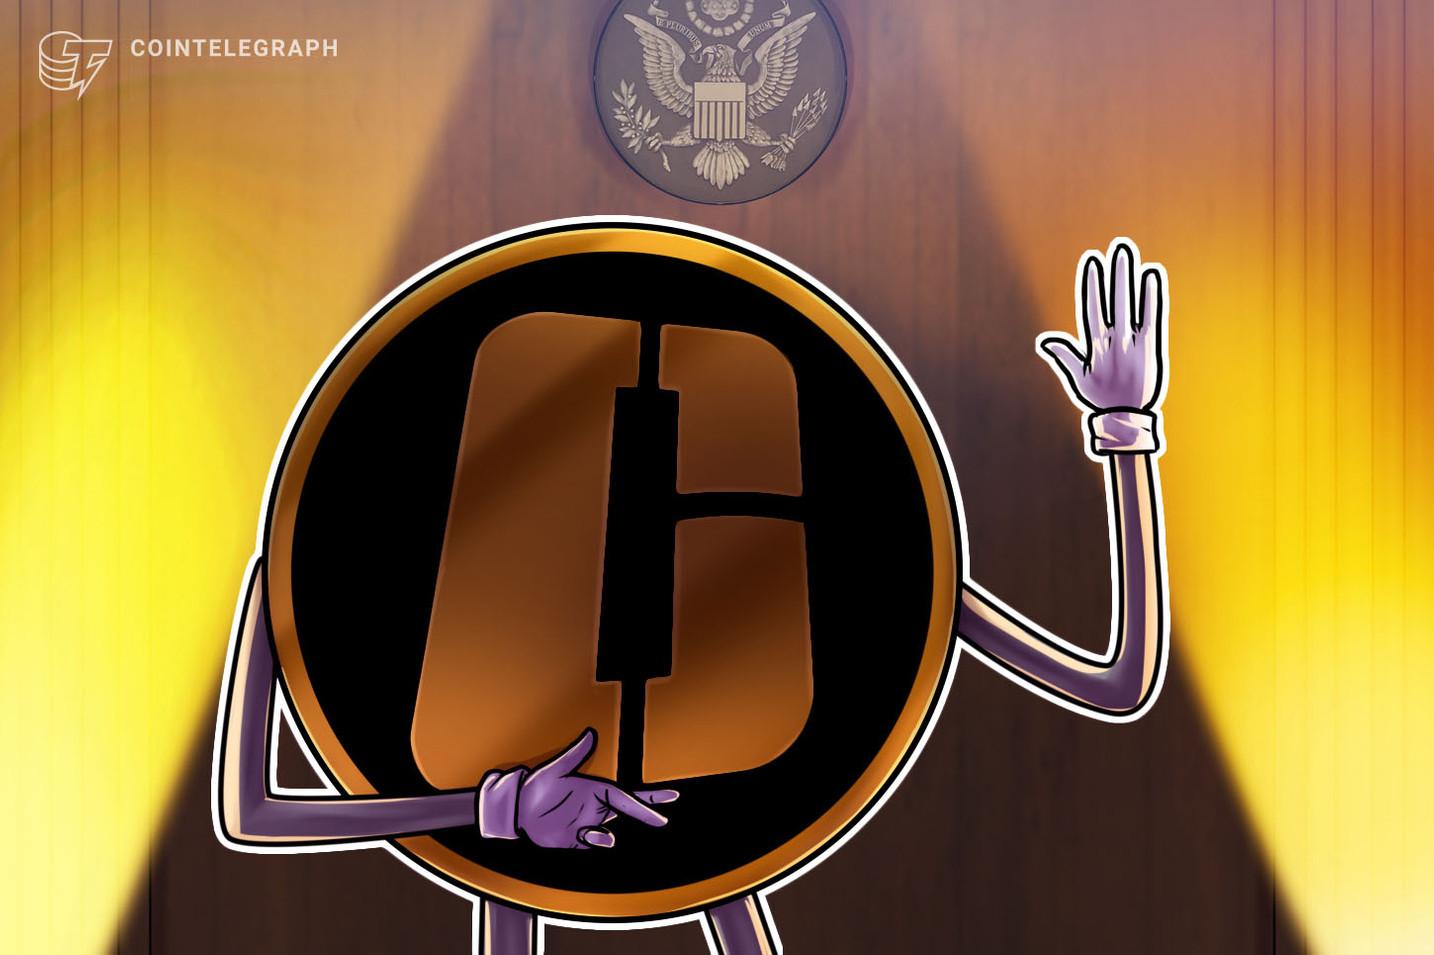 La Corte de EE.UU. pospone la sentencia por estafa de criptomonedas al cofundador de OneCoin